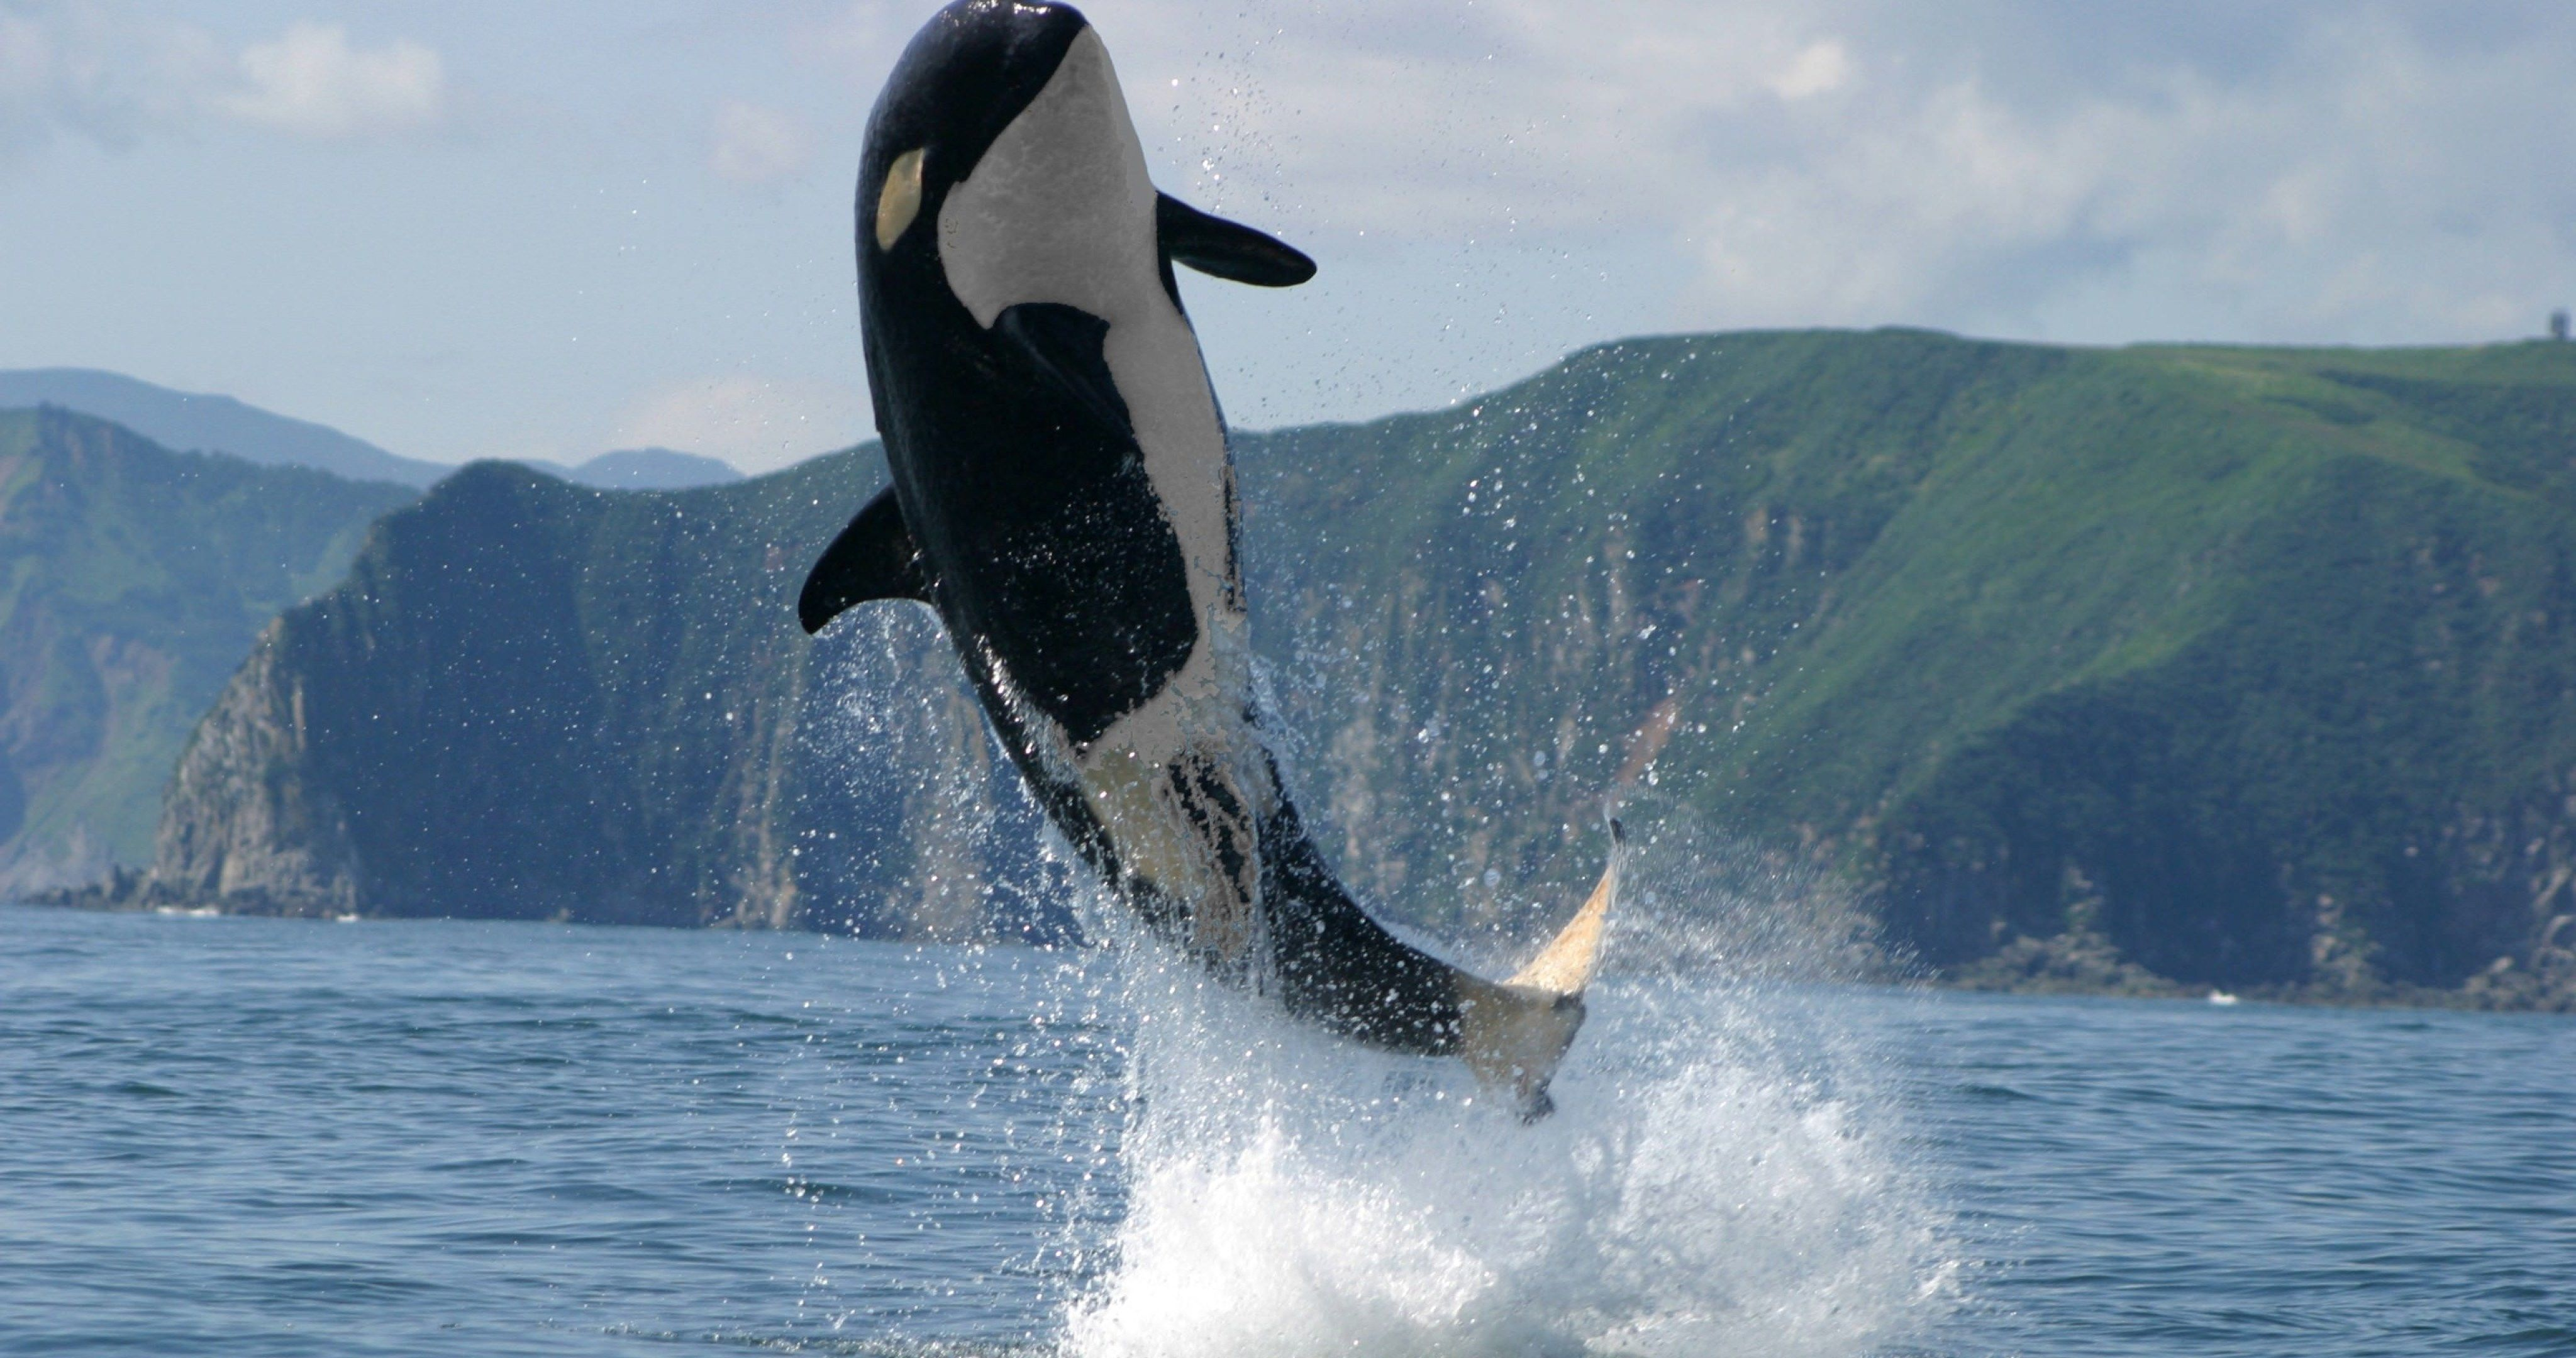 Orca jump 4k ultra hd wallpaper sharovarka pinterest hd wallpaper orca jump 4k ultra hd wallpaper altavistaventures Images